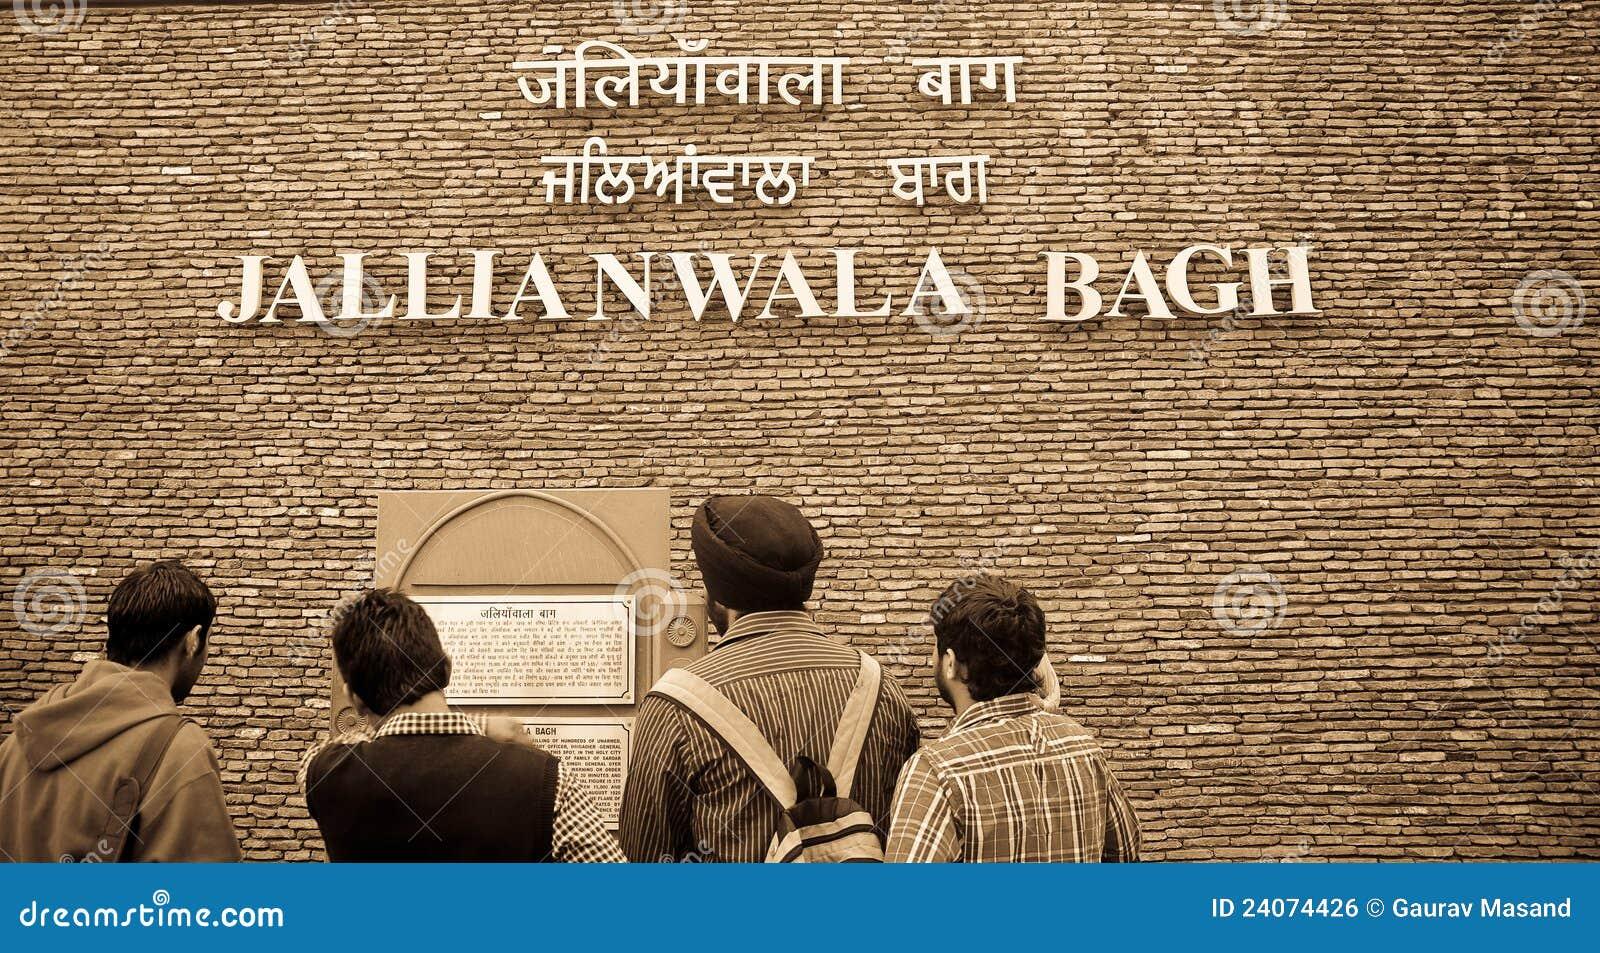 jallianwala bagh video download